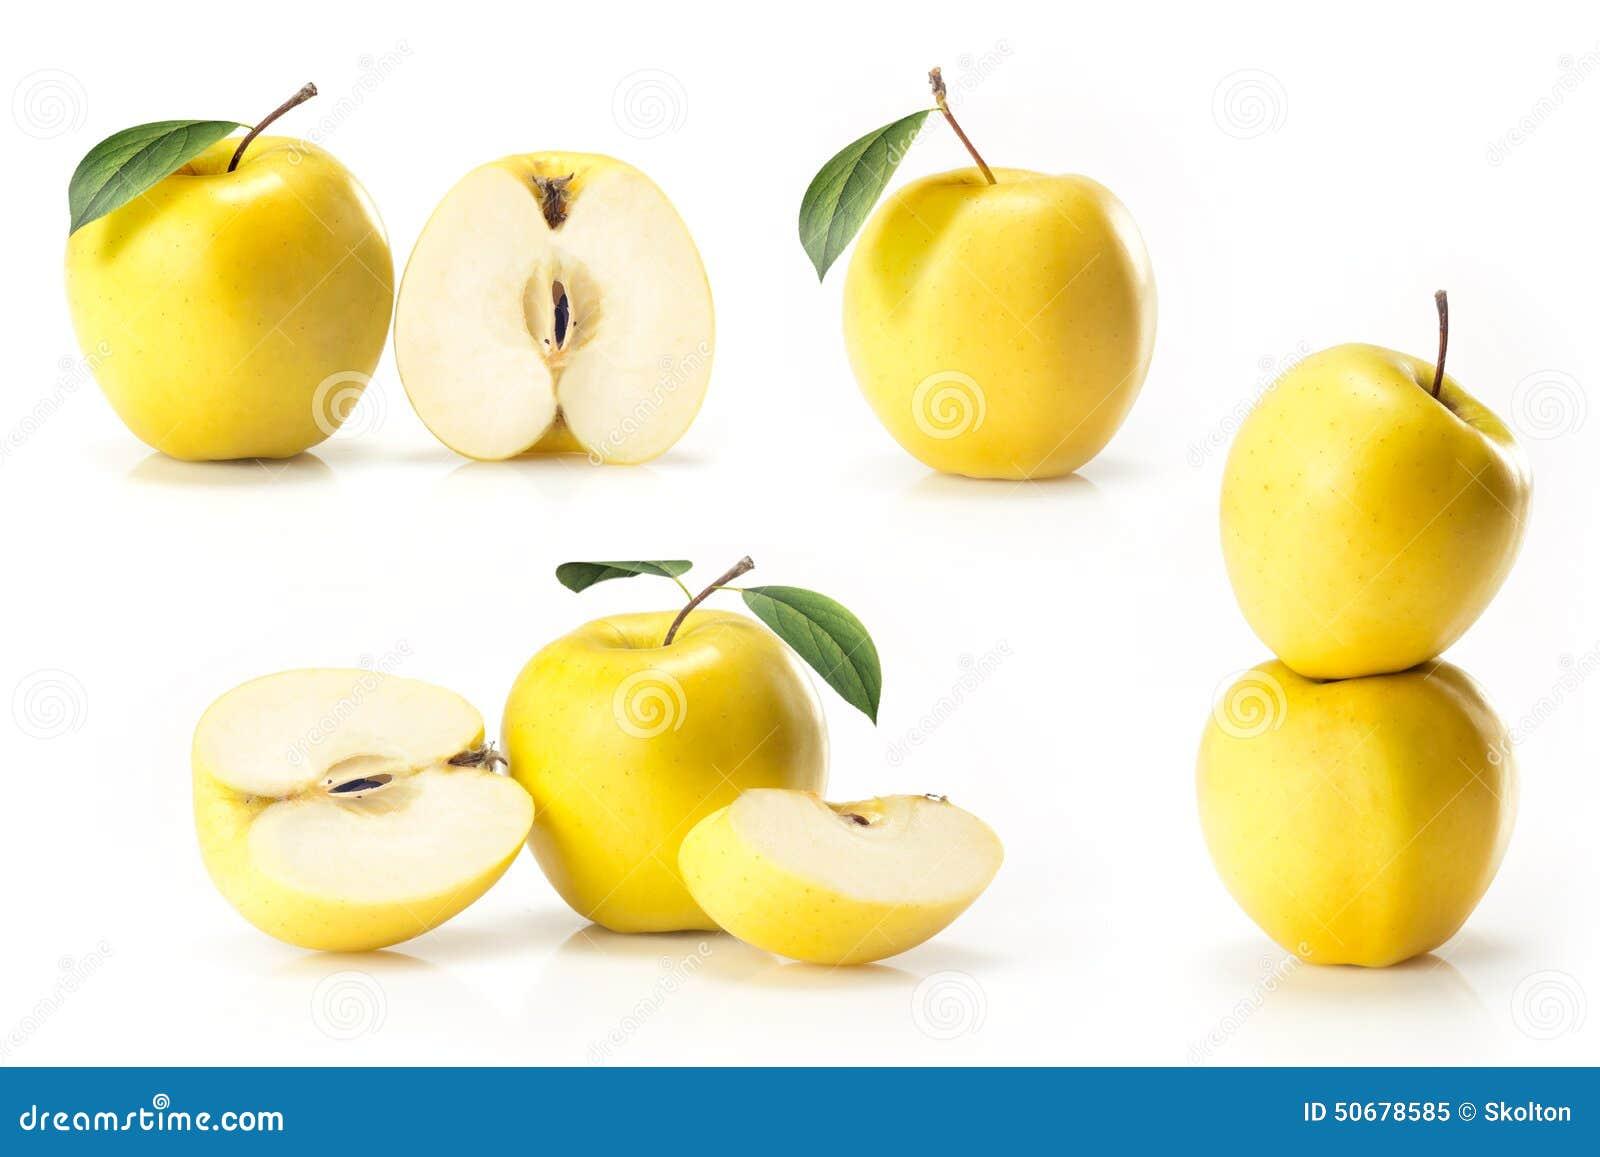 Download 黄色金黄苹果综合 库存图片. 图片 包括有 自由, 营养素, 金黄, 水多, 健康, 蜜饯, 食物, 新鲜 - 50678585